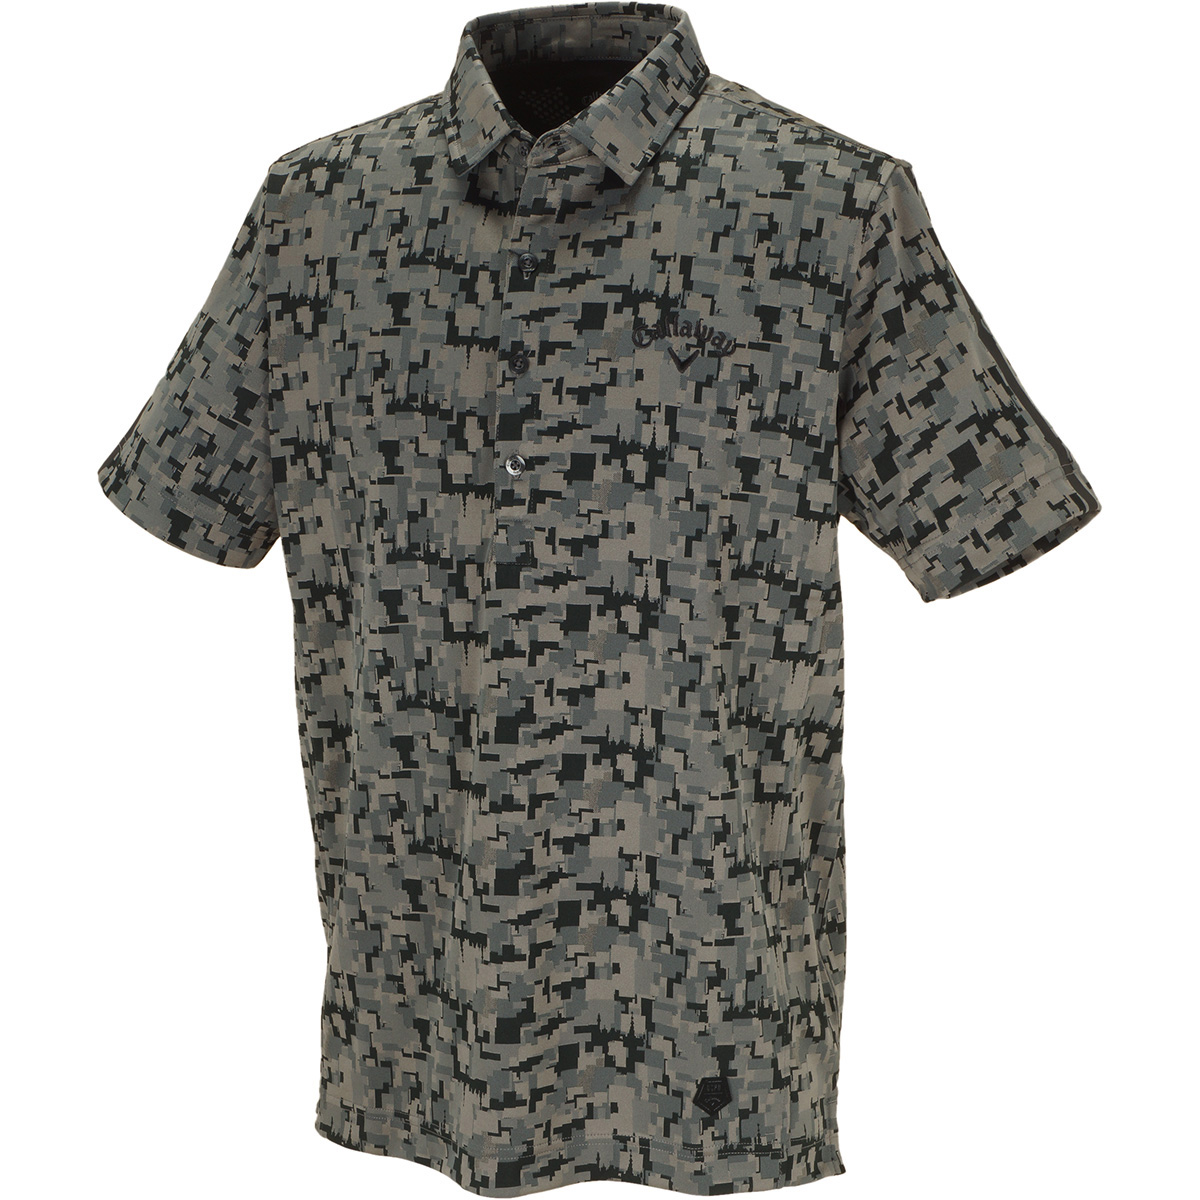 TOKYOデジカモ ジャカード 半袖ポロシャツ